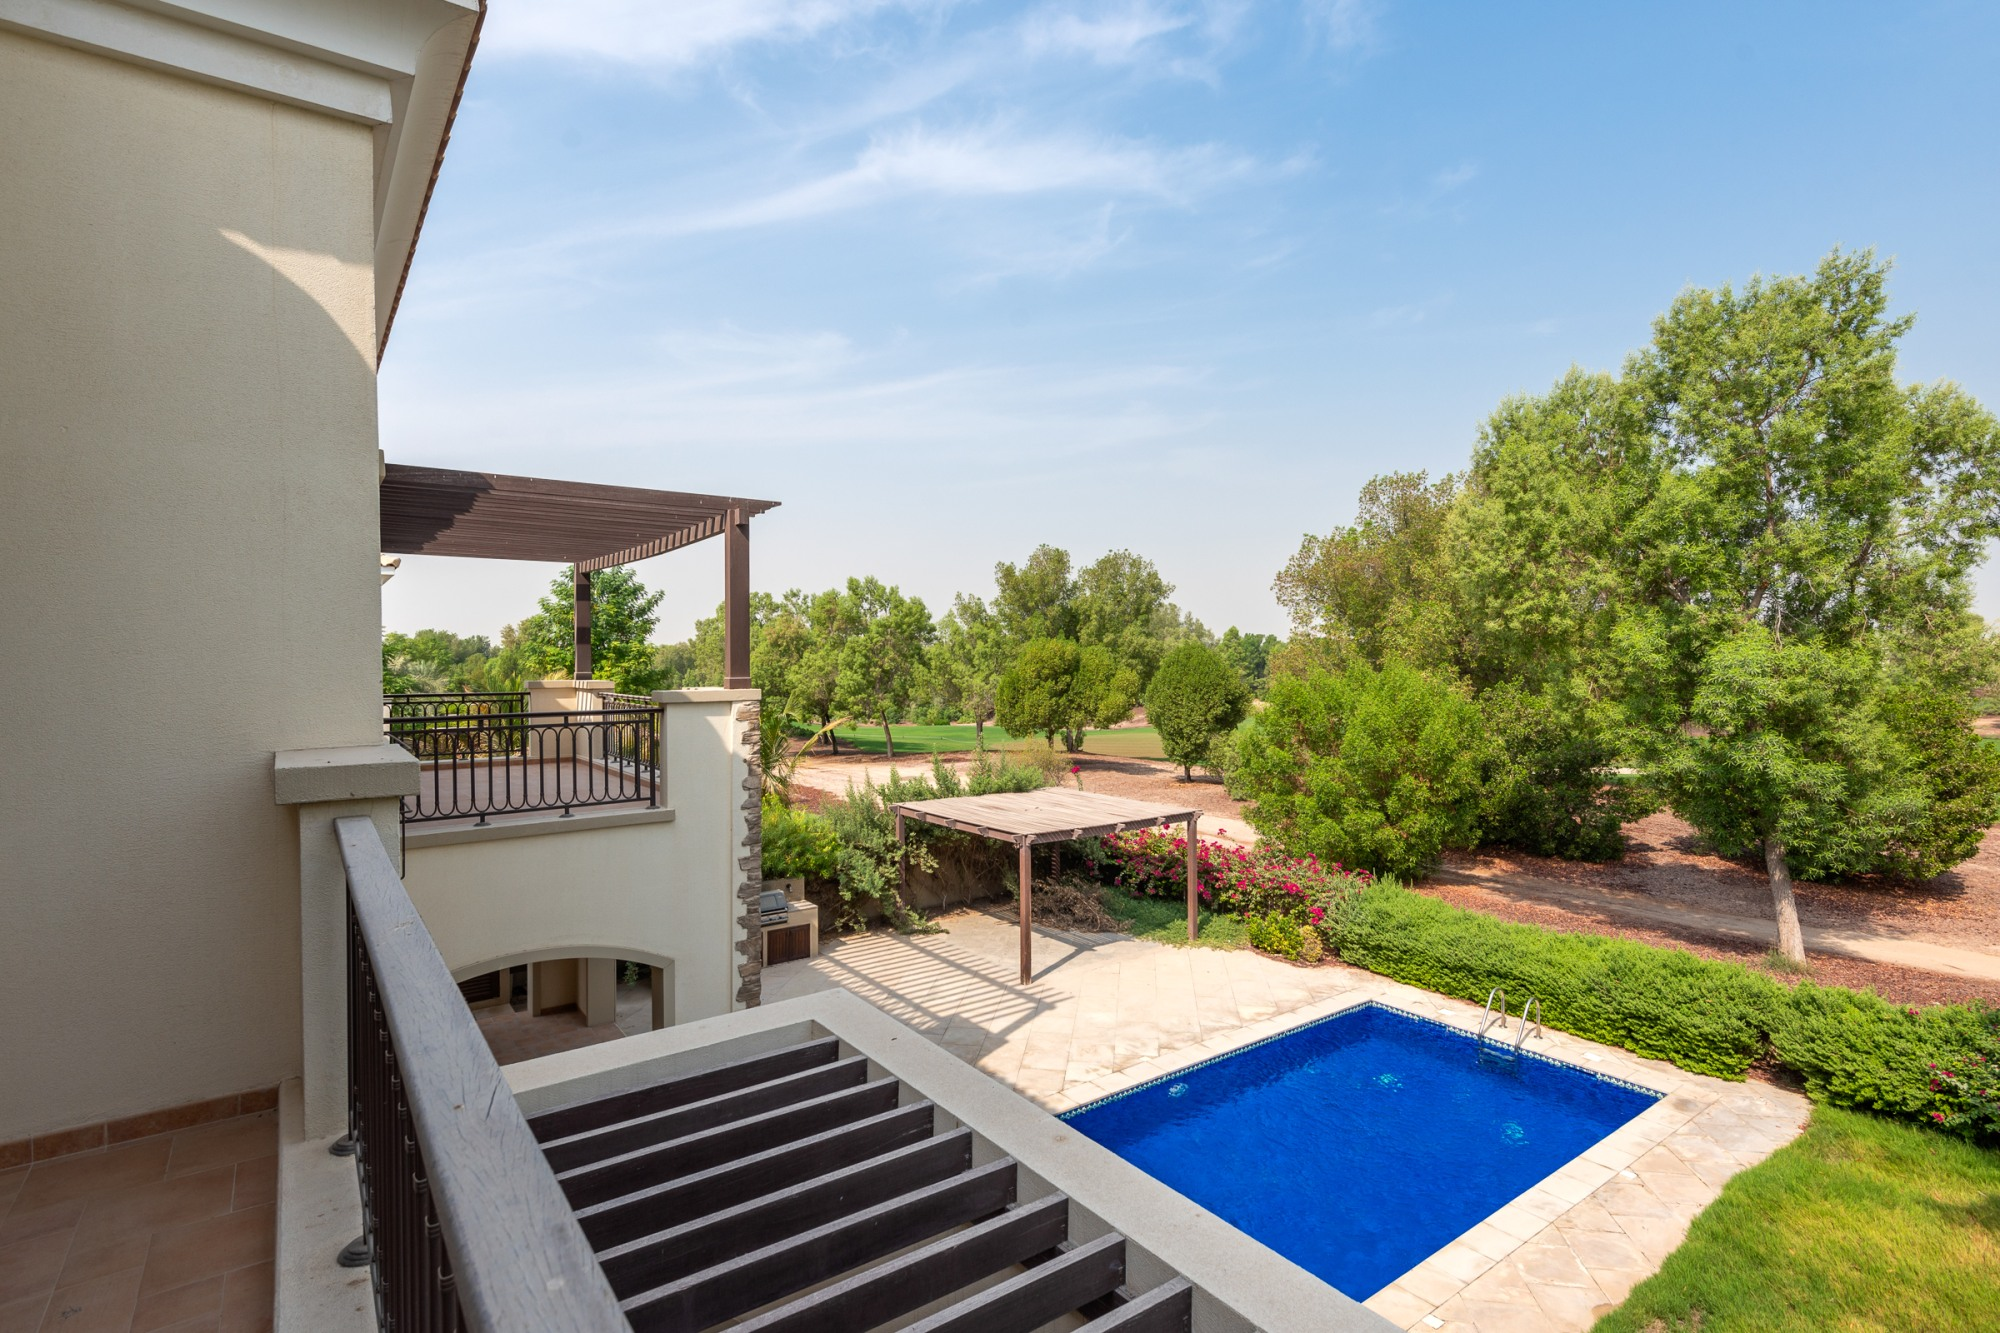 5 Bed Valencia | Vacant | Golf & Lake View